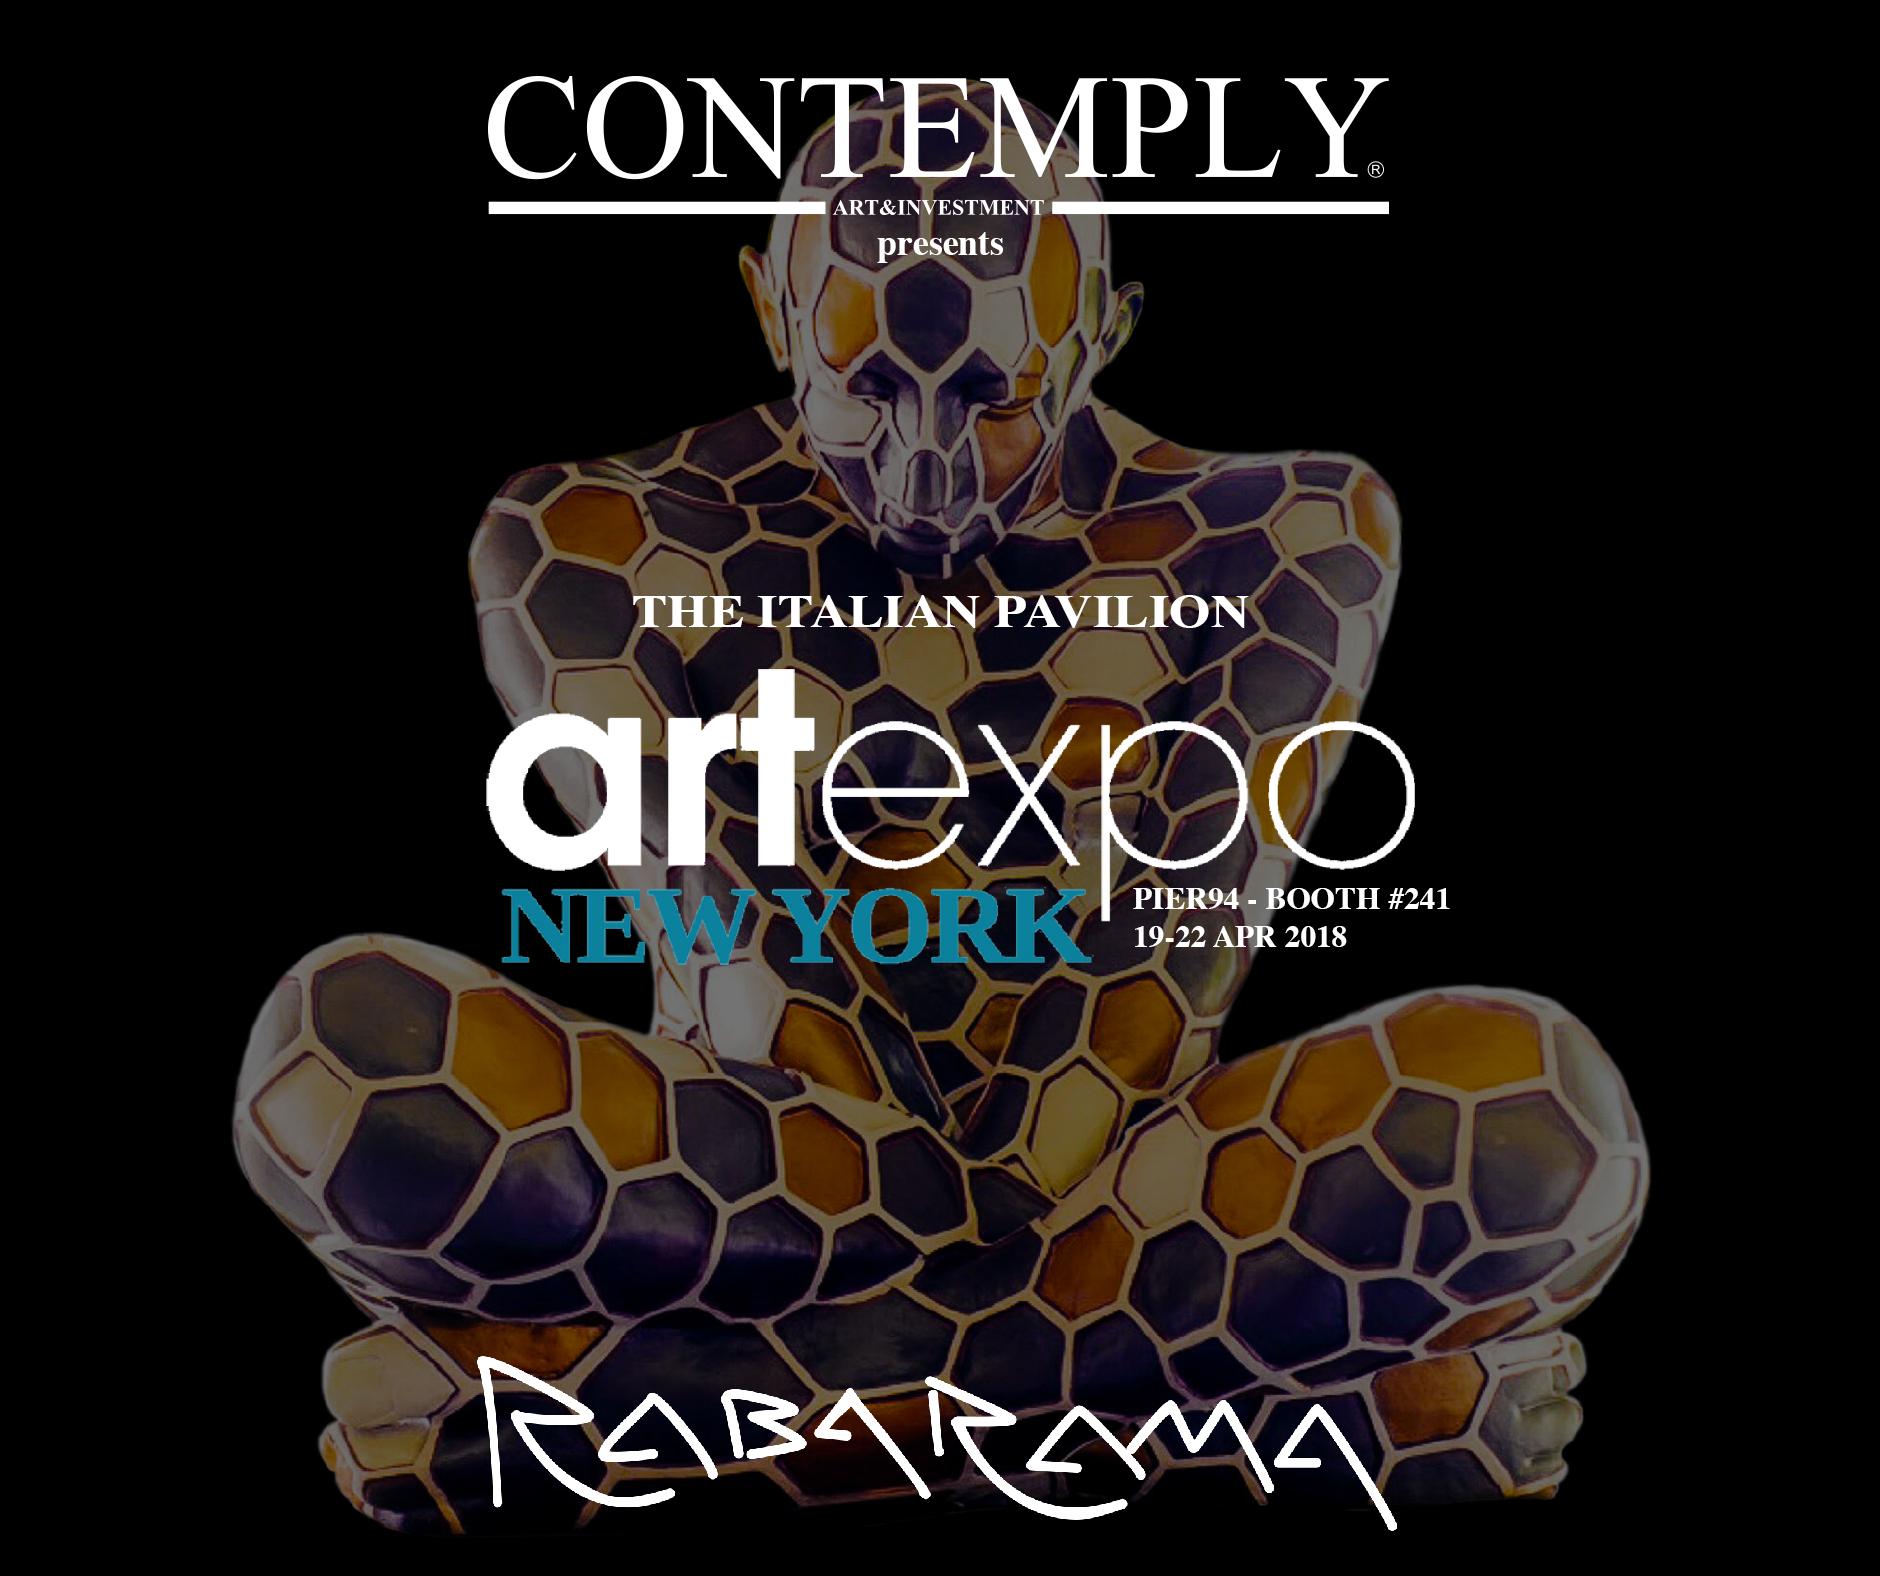 ArtExpo New York 2018